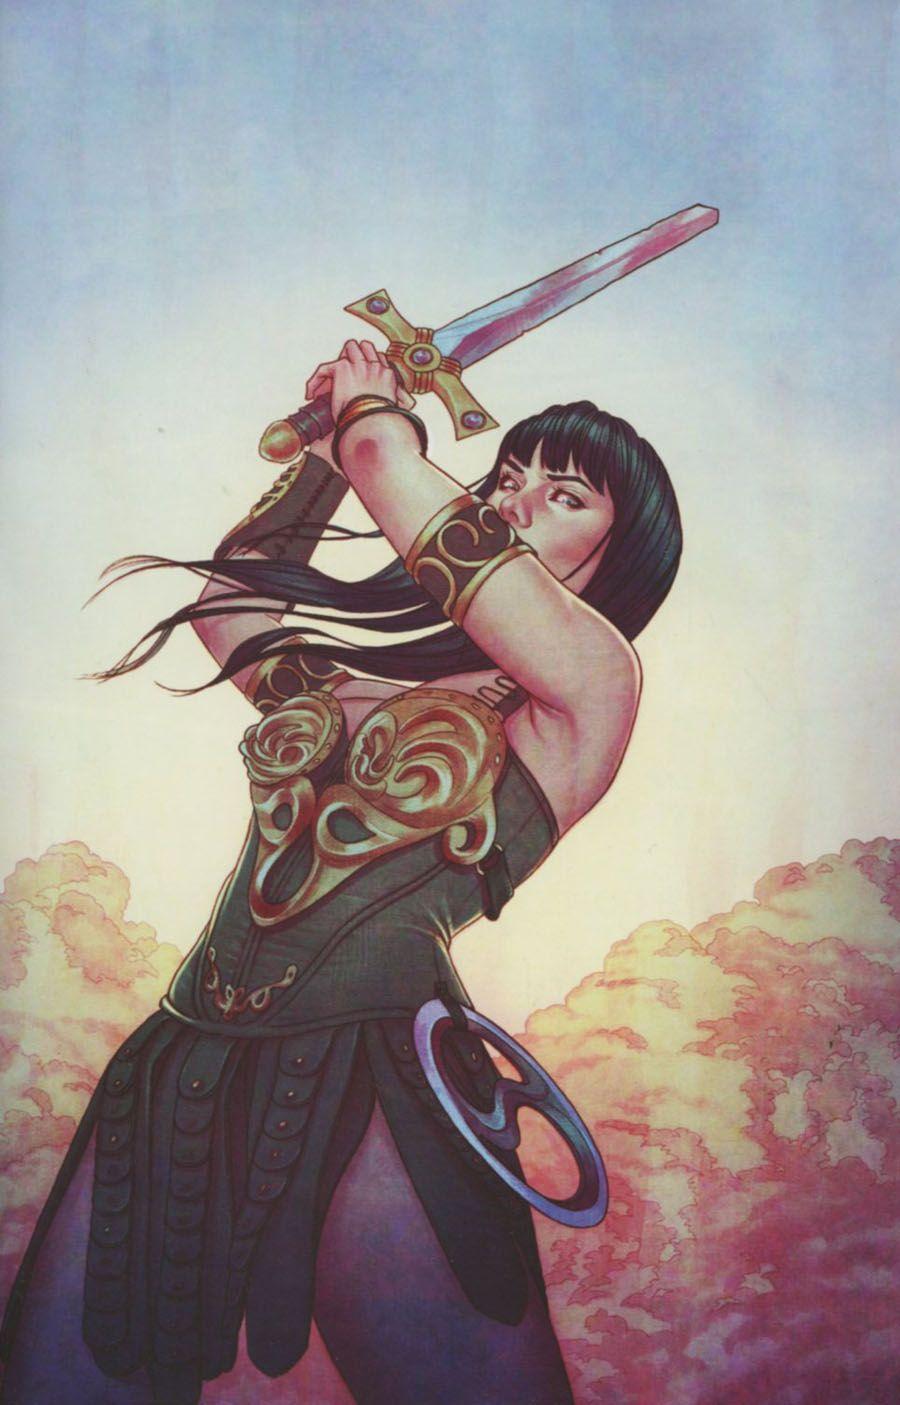 Xena warrior princess vol 3 #5 cover b incentive jenny frison virgin